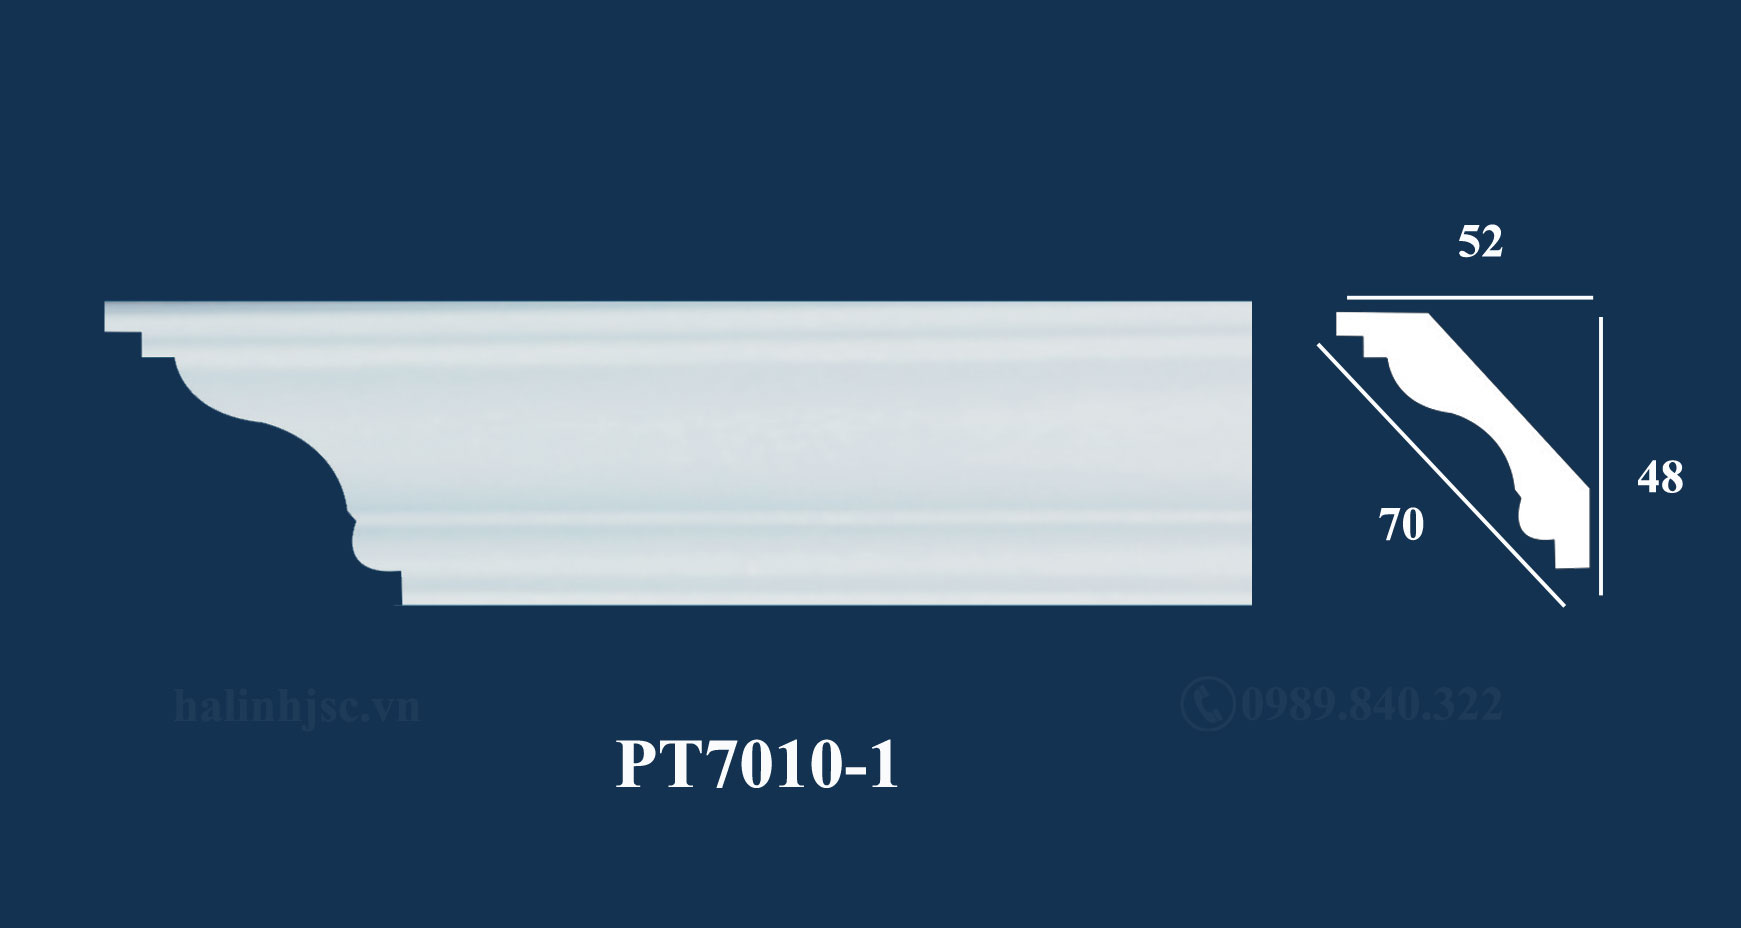 phao-chi-ps-goc-tran-pt7010